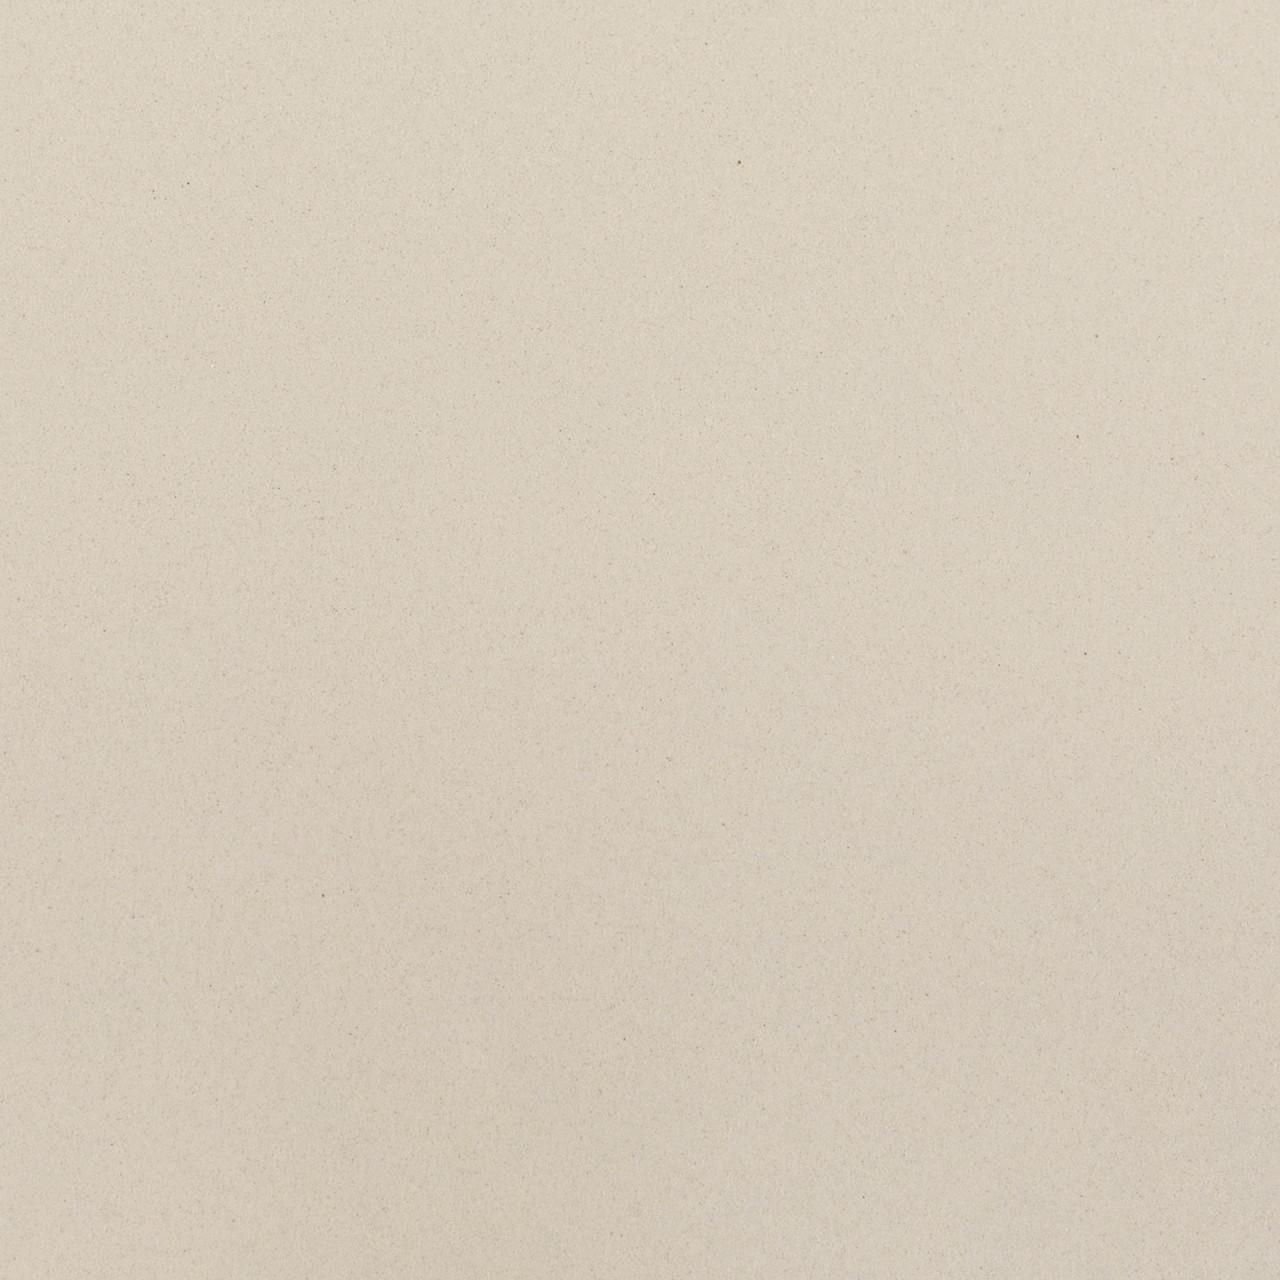 Плитка для пола ГРЕС 12 мм MN 000 300x300 /11